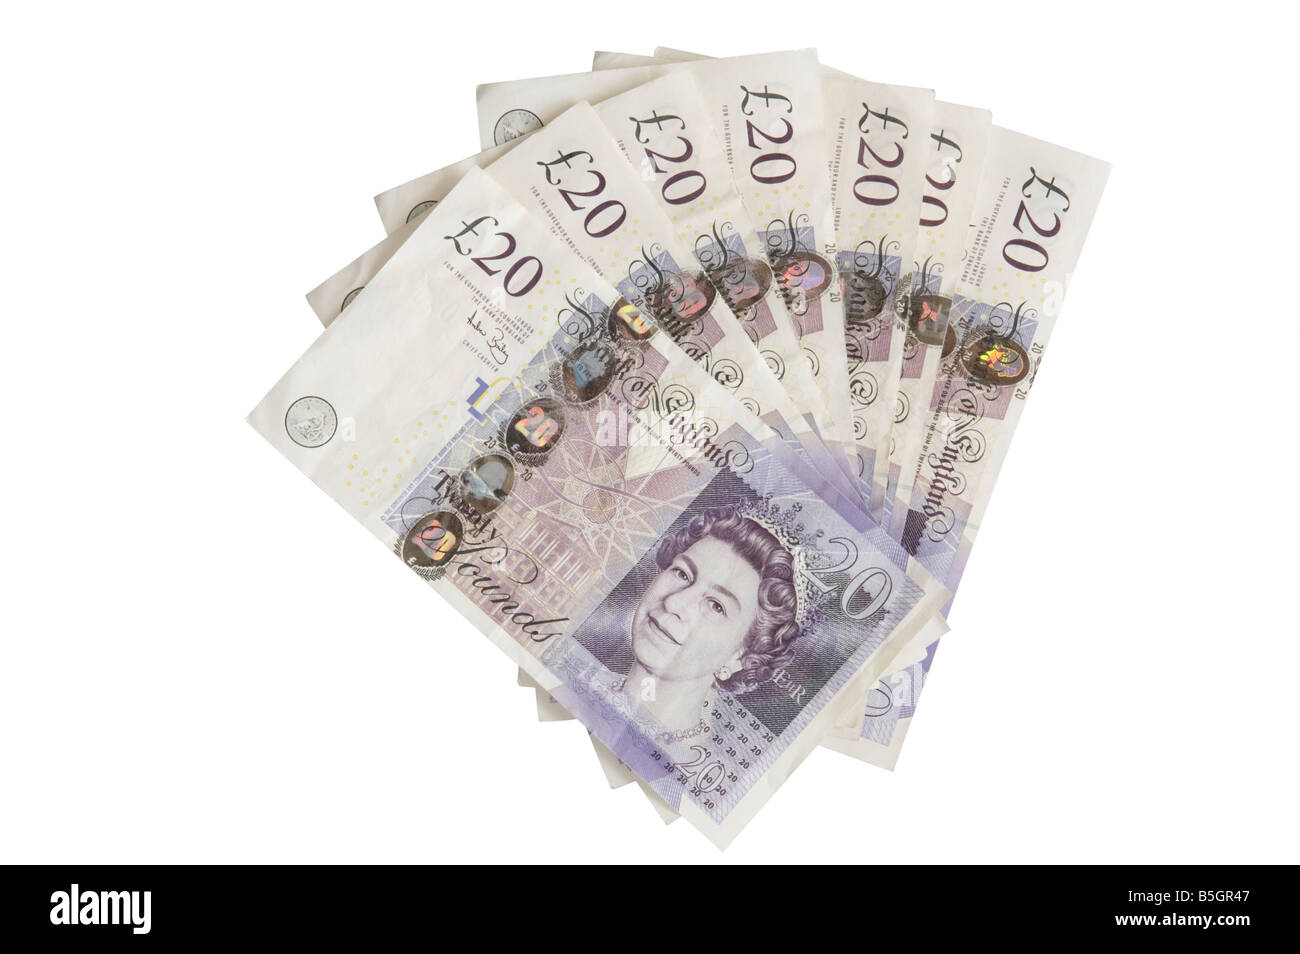 20 Pound Notes cutout onto a white background - Stock Image